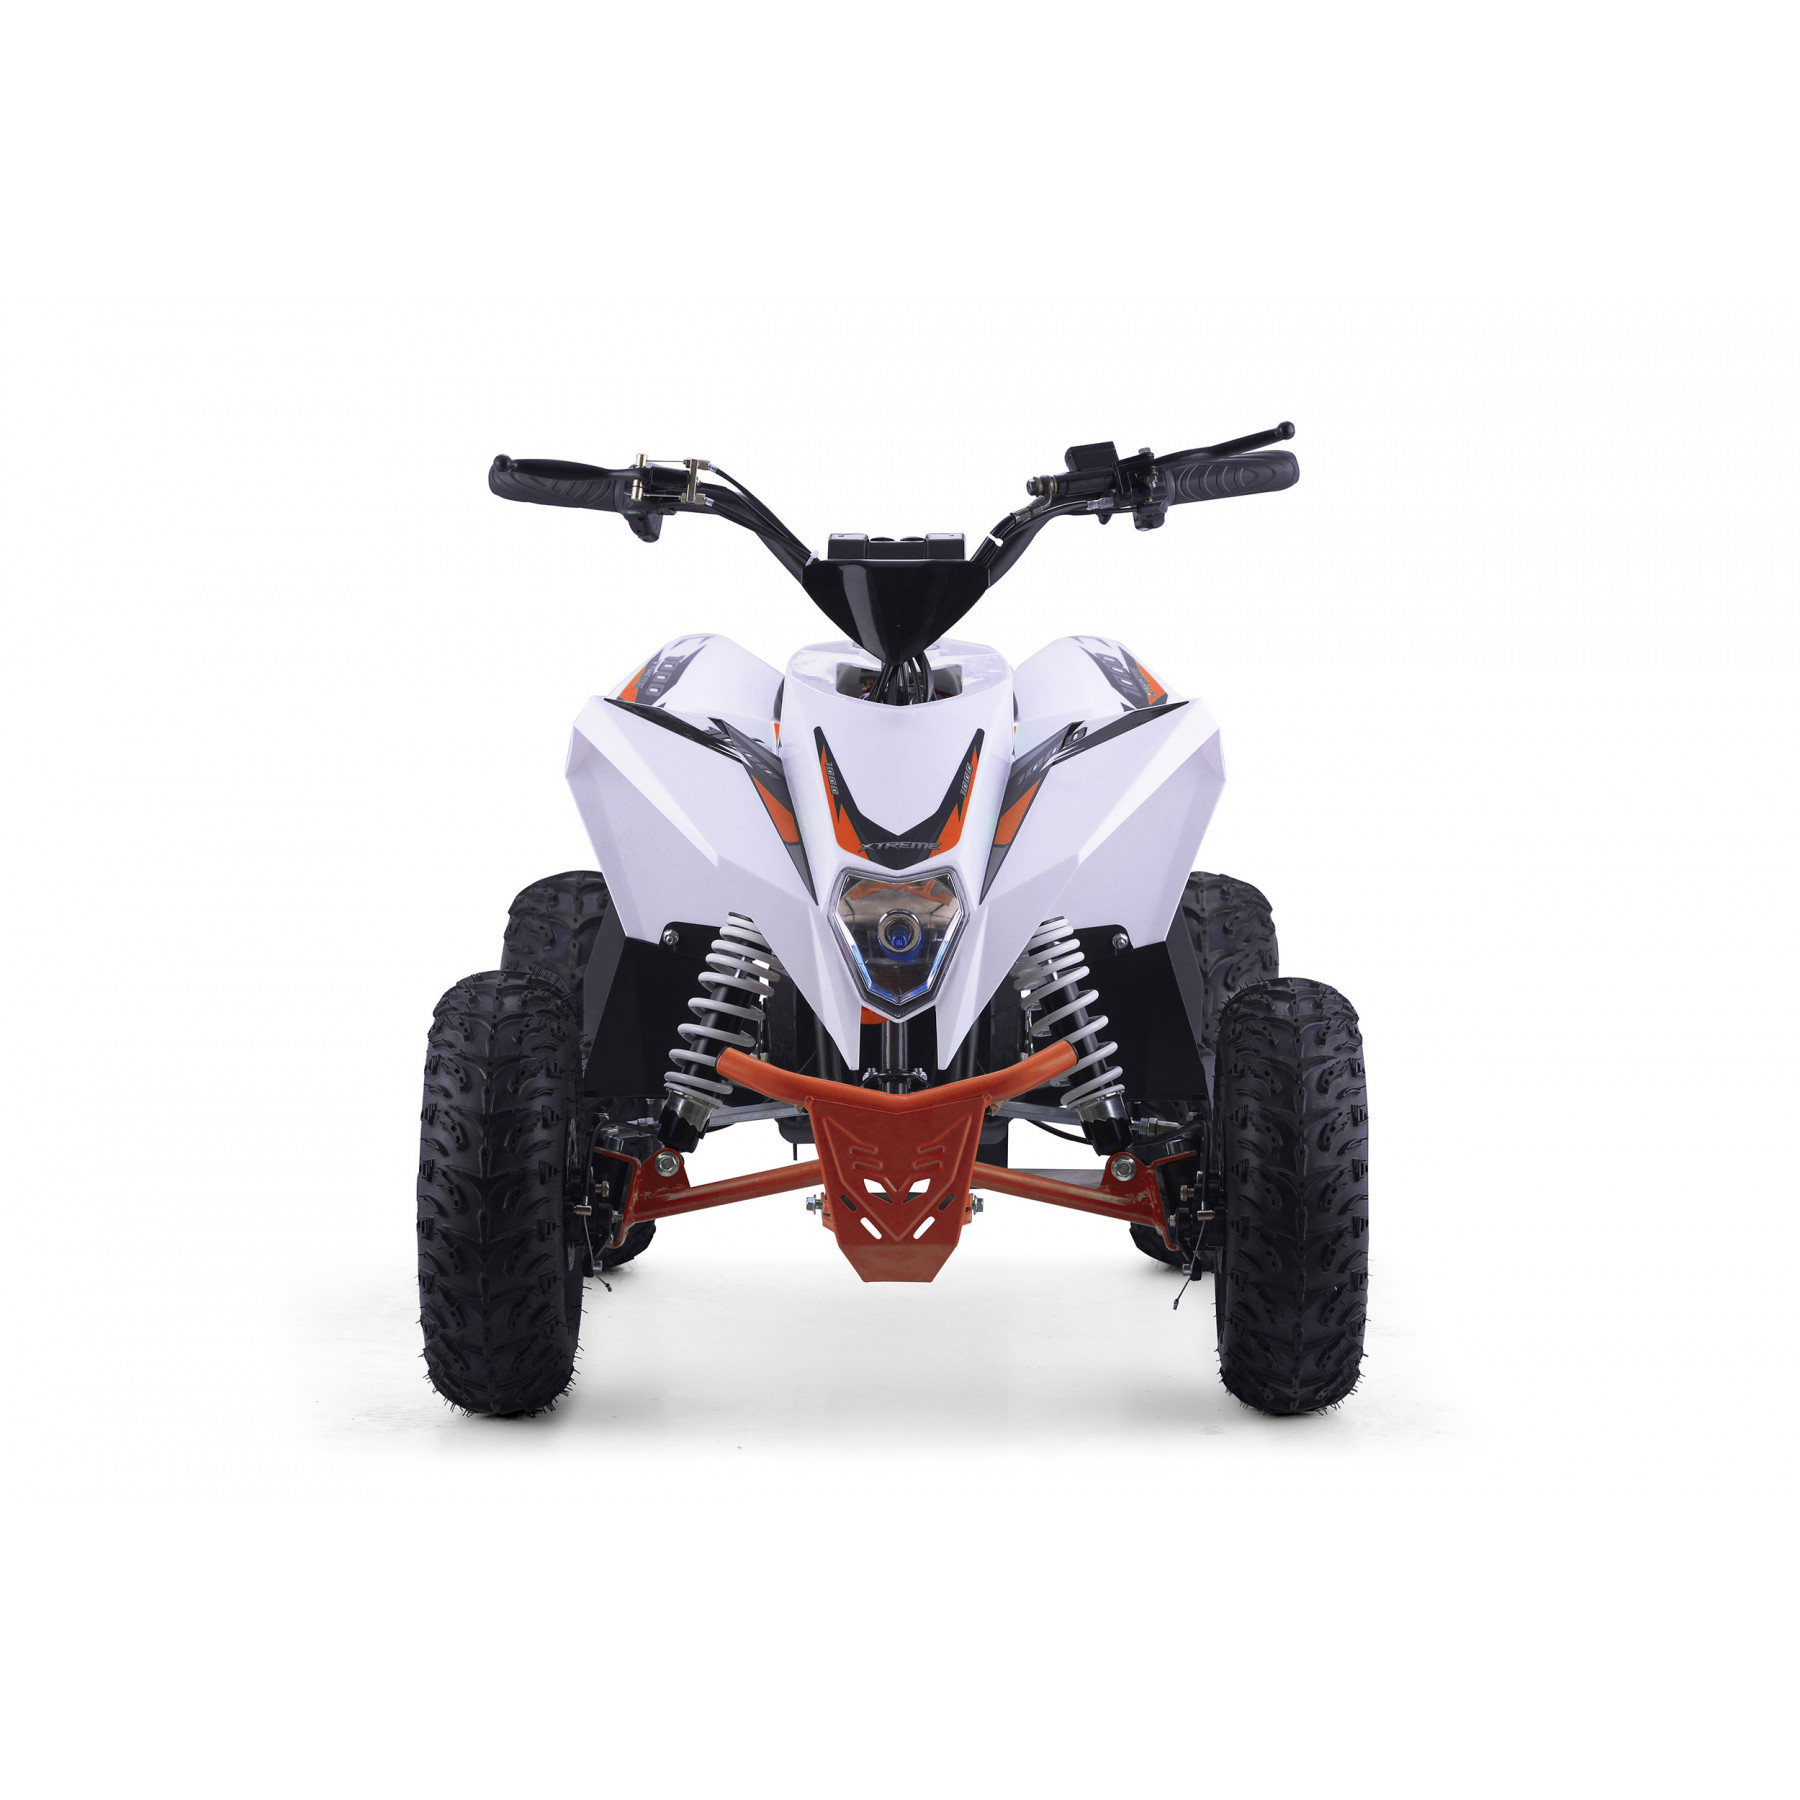 XTM RACING 48v 1300w LITHIUM QUAD BIKE WHITE ORANGE